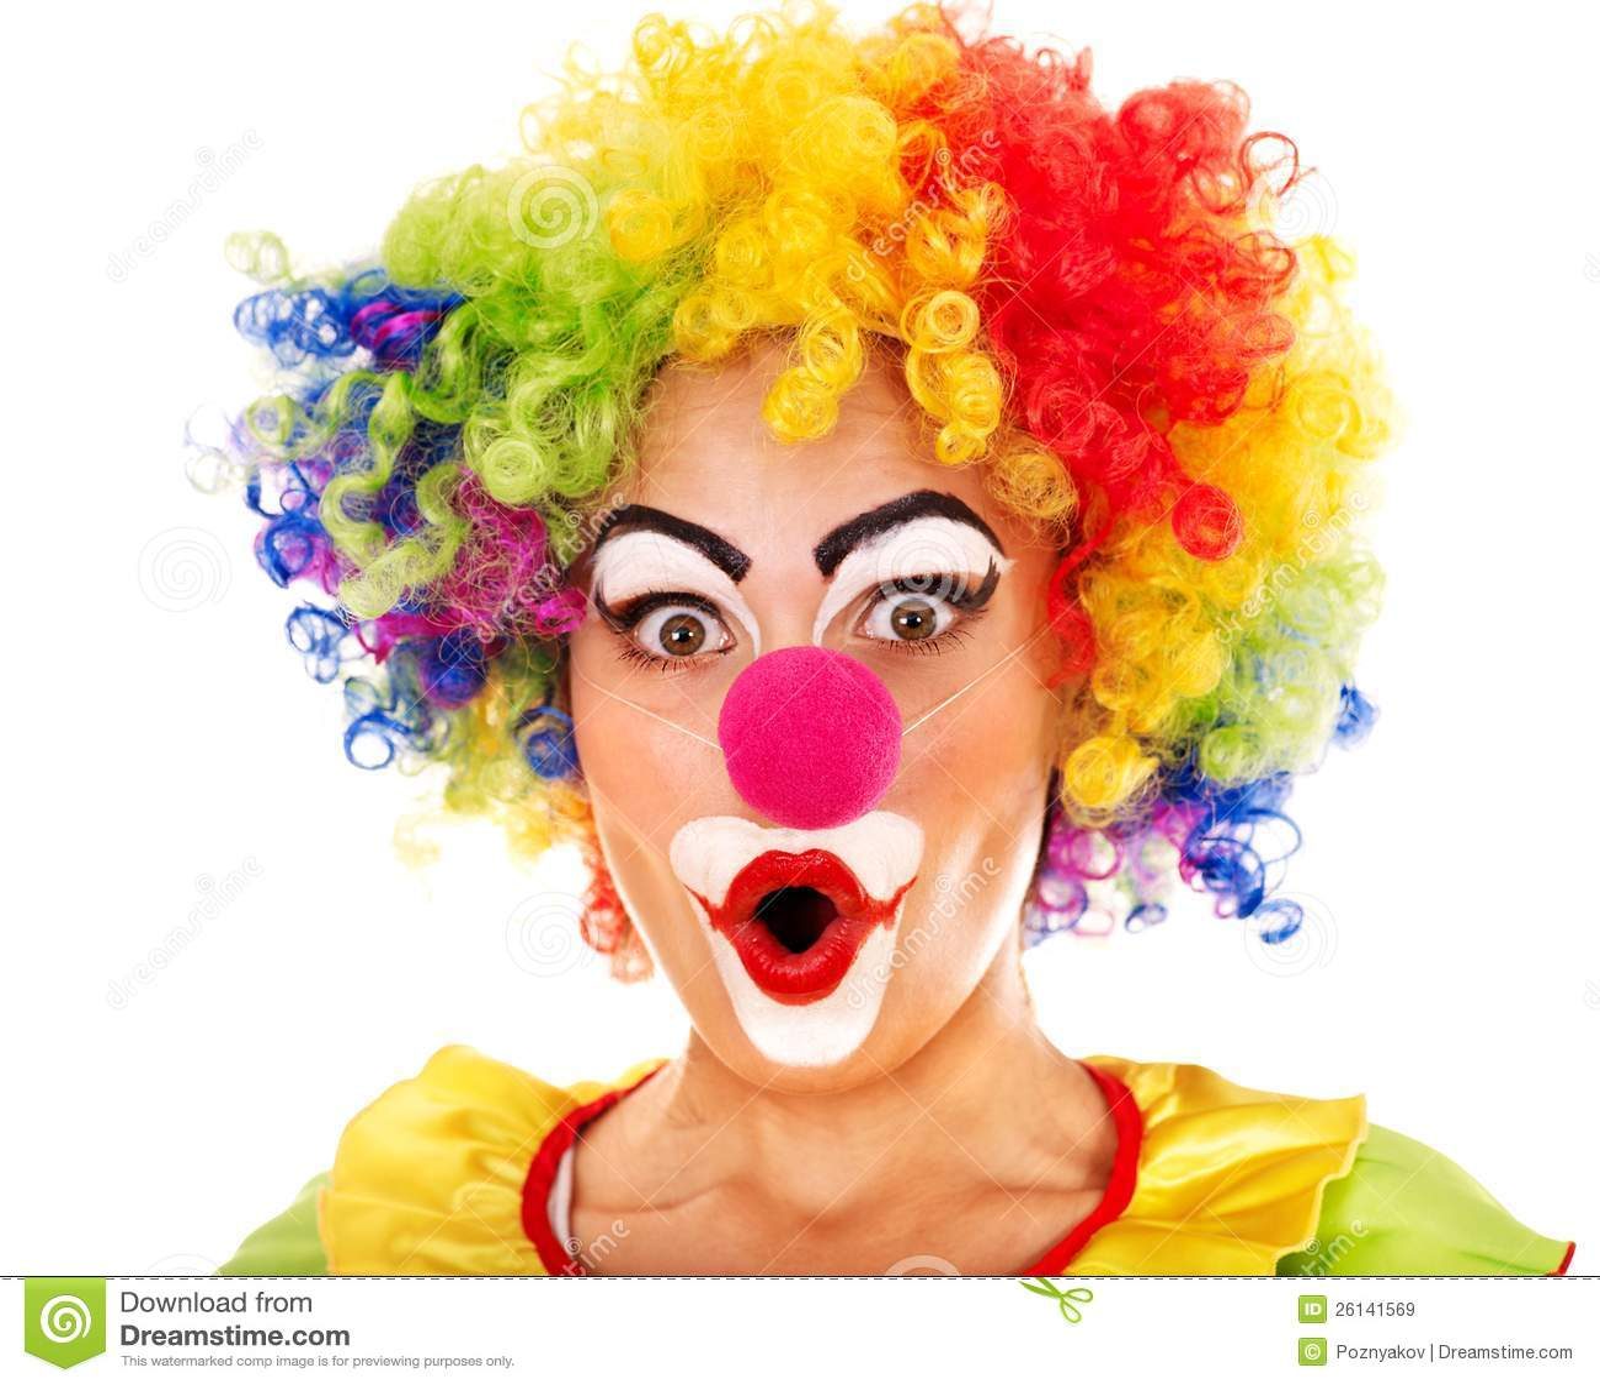 portrait of clown royalty free stock images image 26141569. Black Bedroom Furniture Sets. Home Design Ideas